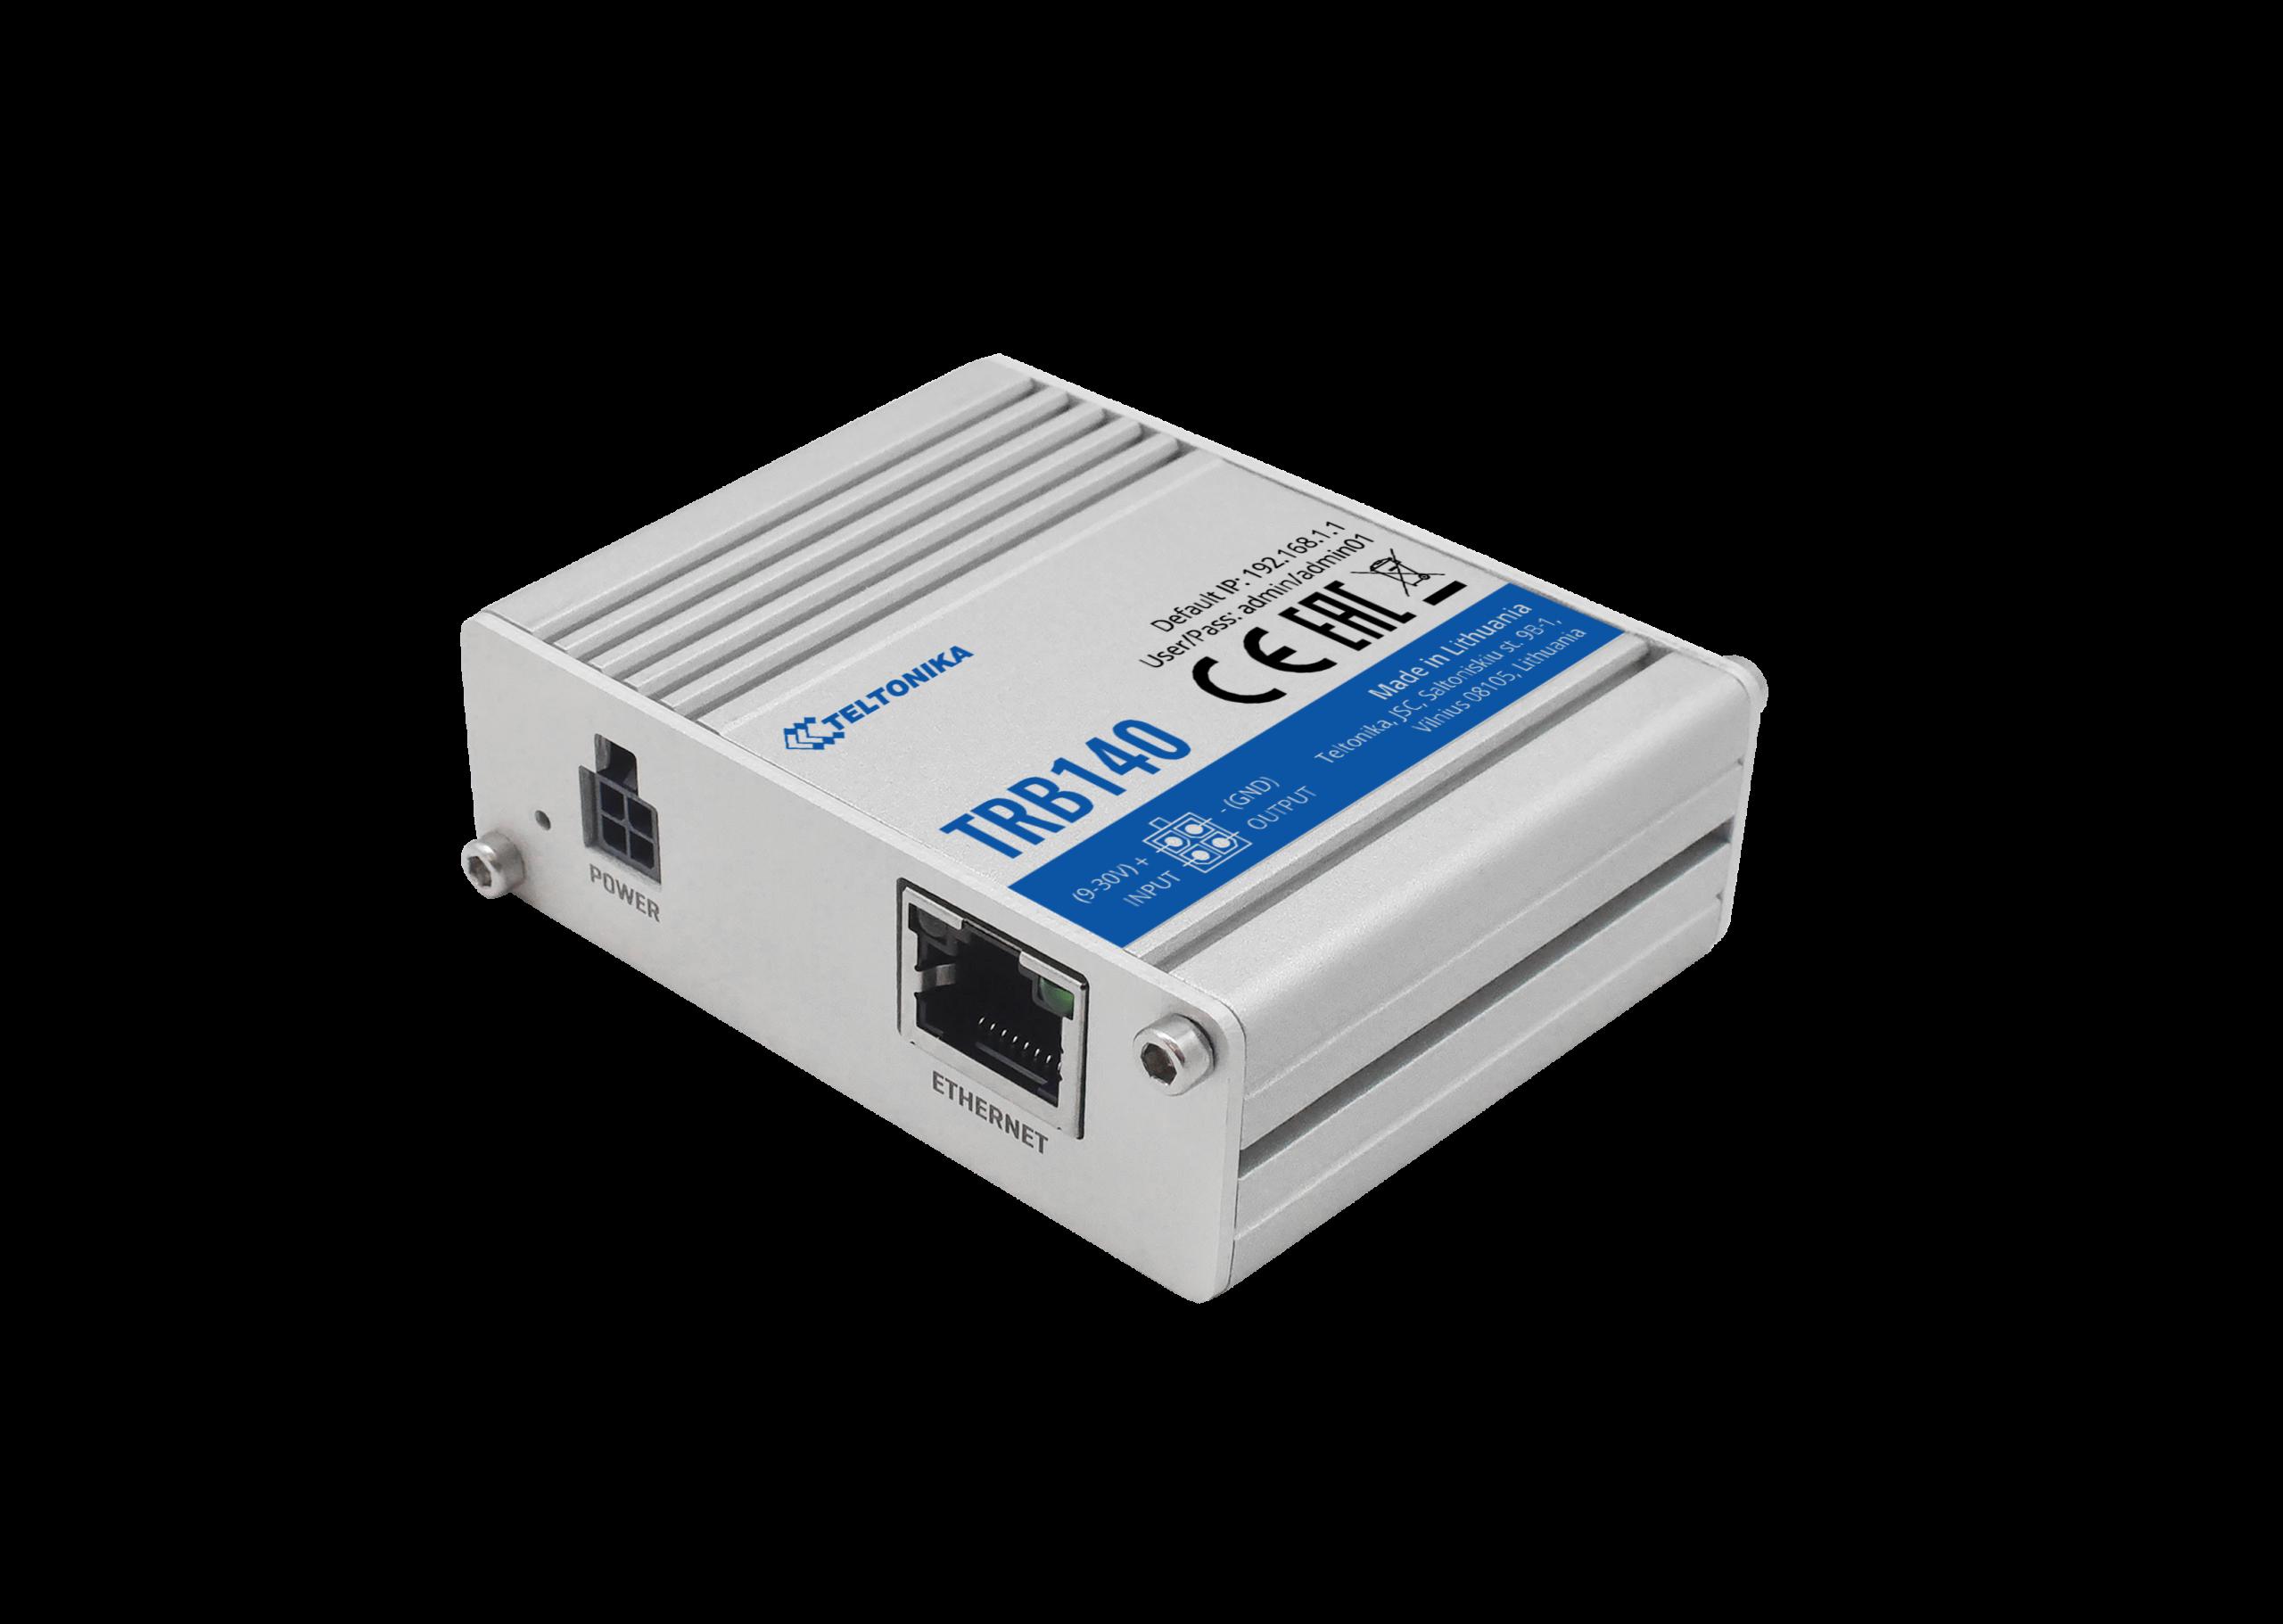 TRB140 – Gateway LTE CAT4 con interfaz Ethernet